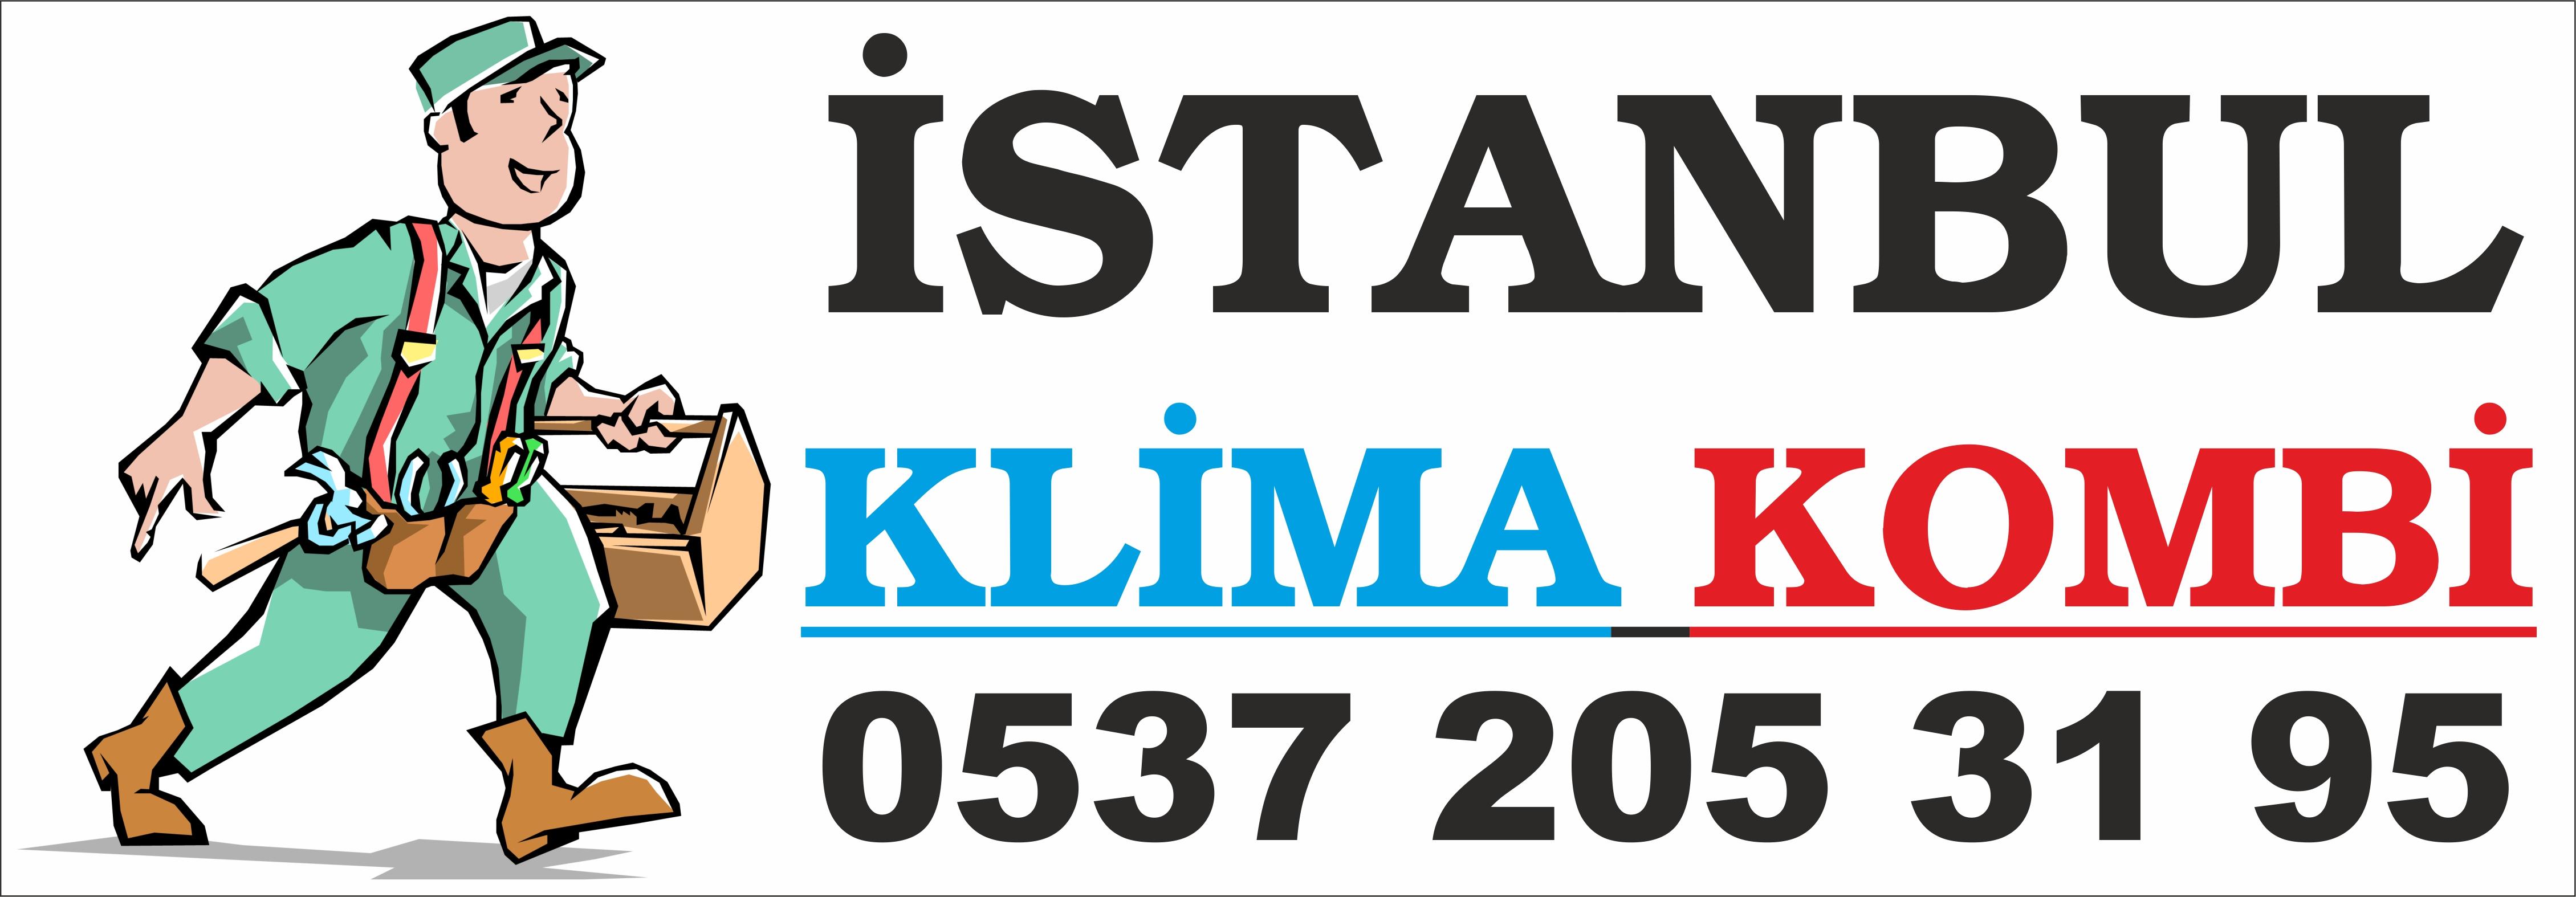 İstanbul Klima Kombi 537 205 31 95